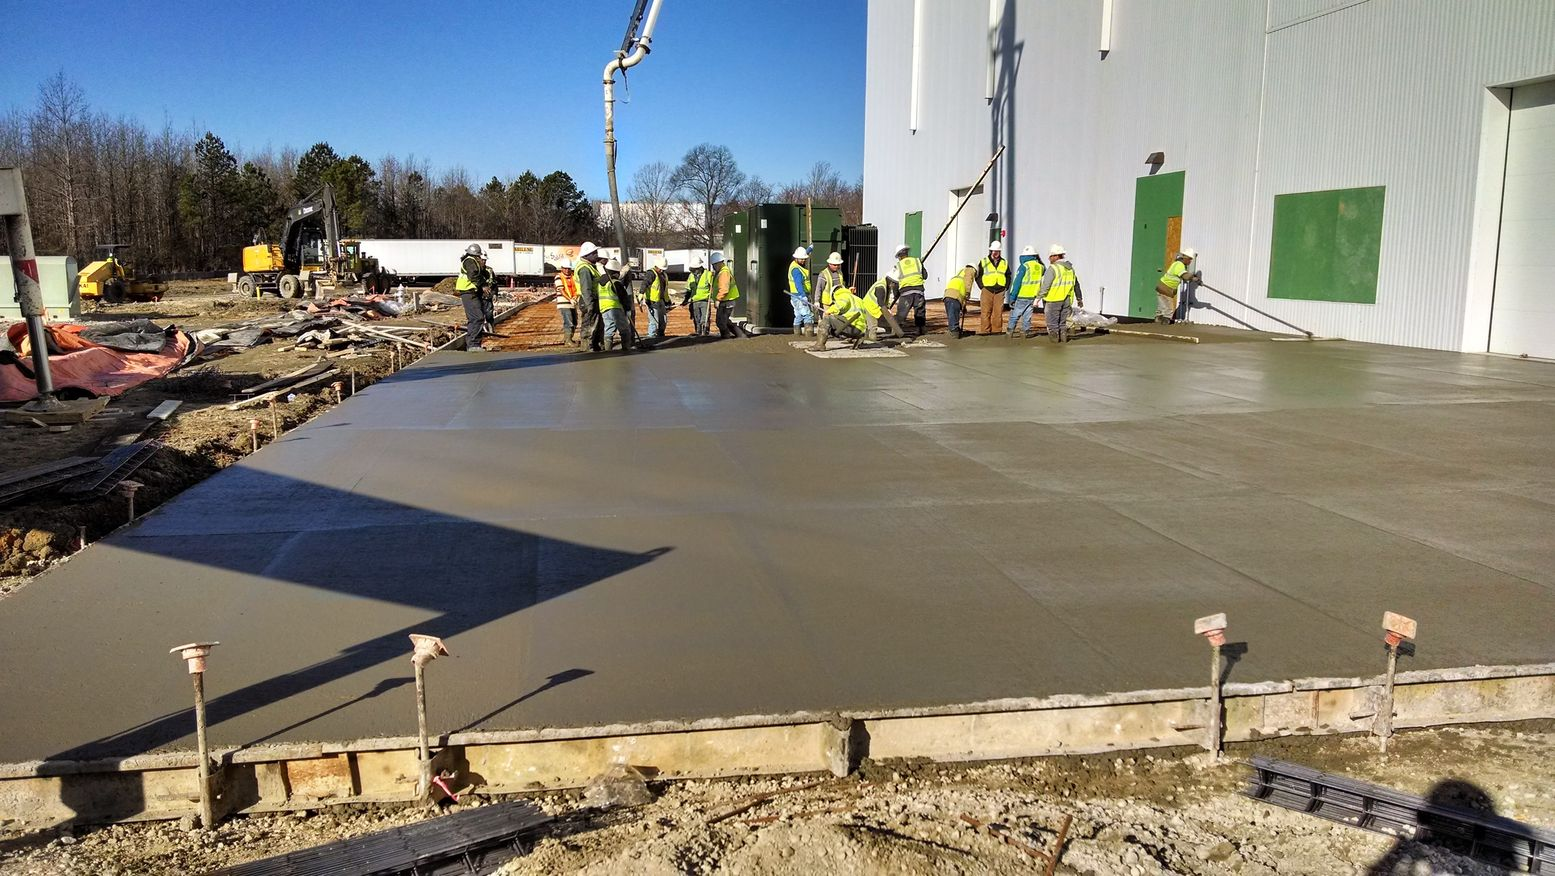 Louis Smith Construction Company Sabra Dipping Company